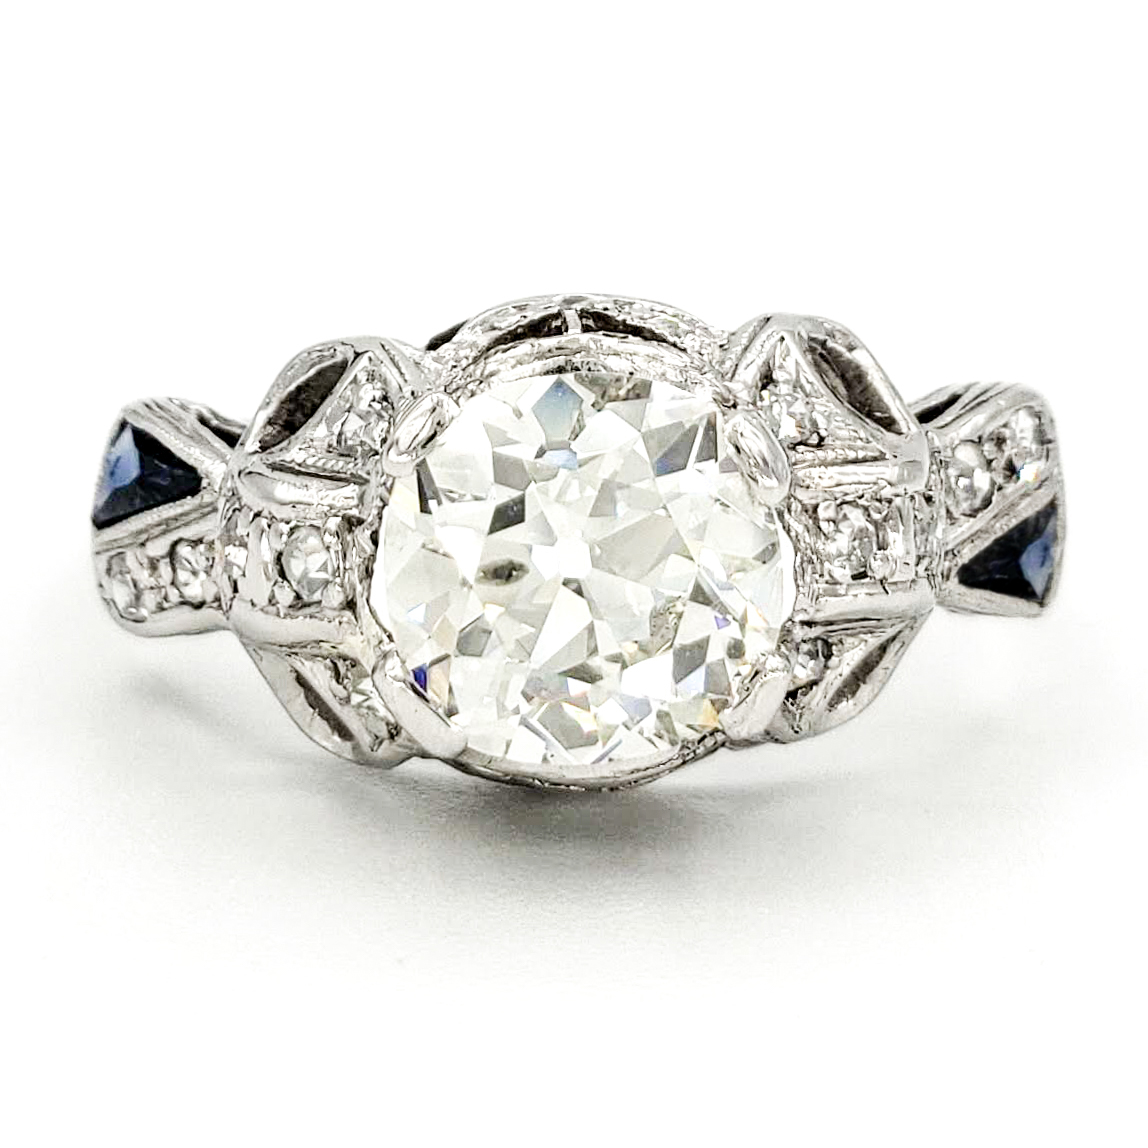 vintage-platinum-engagement-ring-with-1-37-carat-old-european-cut-diamond-egl-h-si2